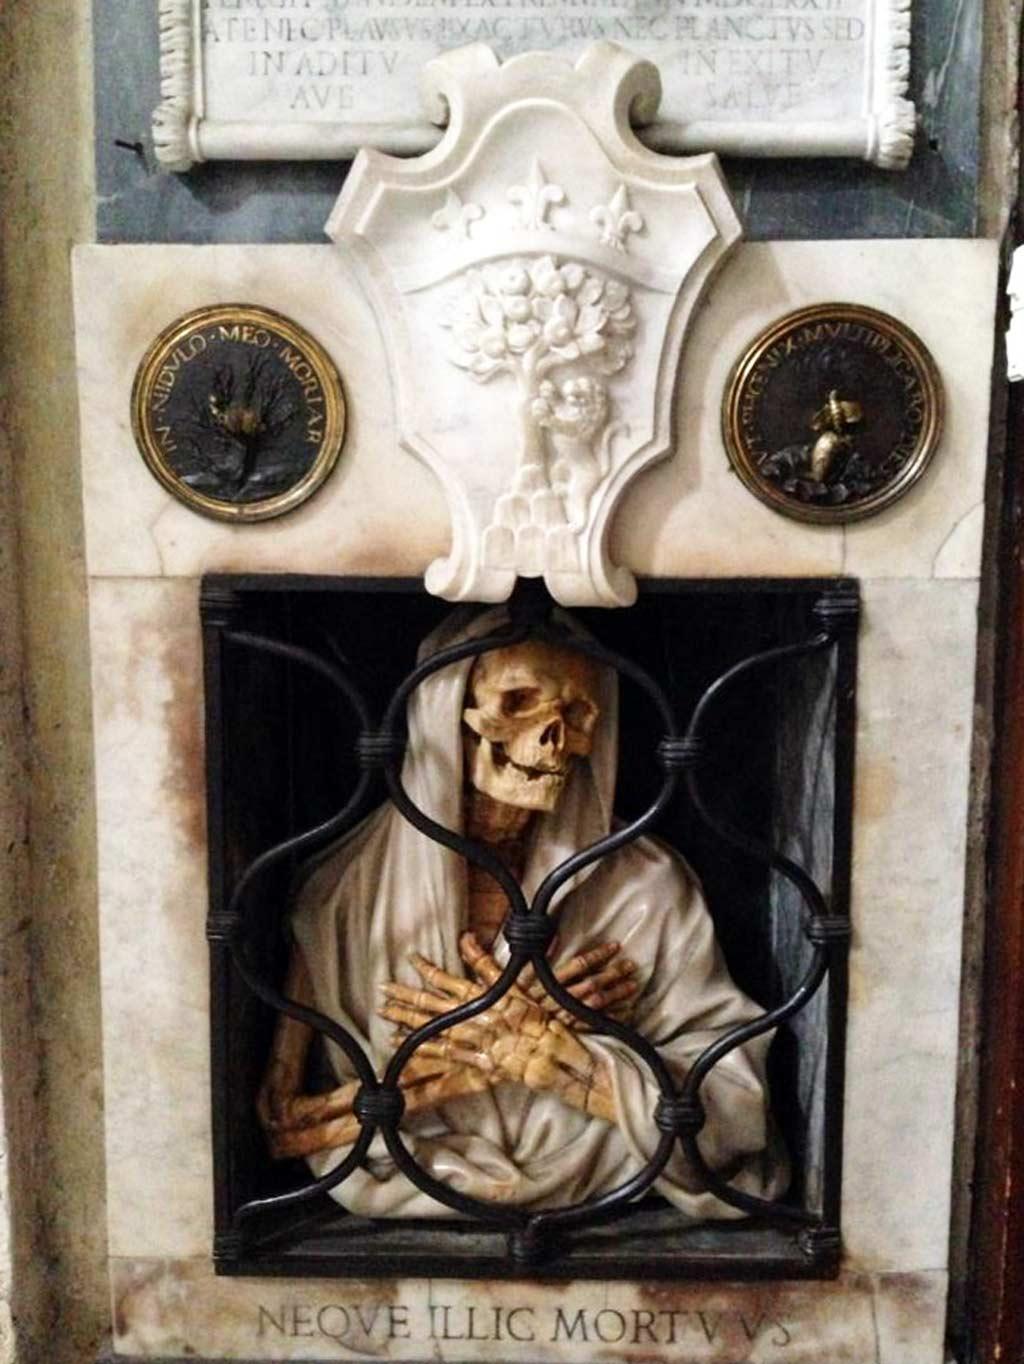 Skeleton details on Gisleni's tomb